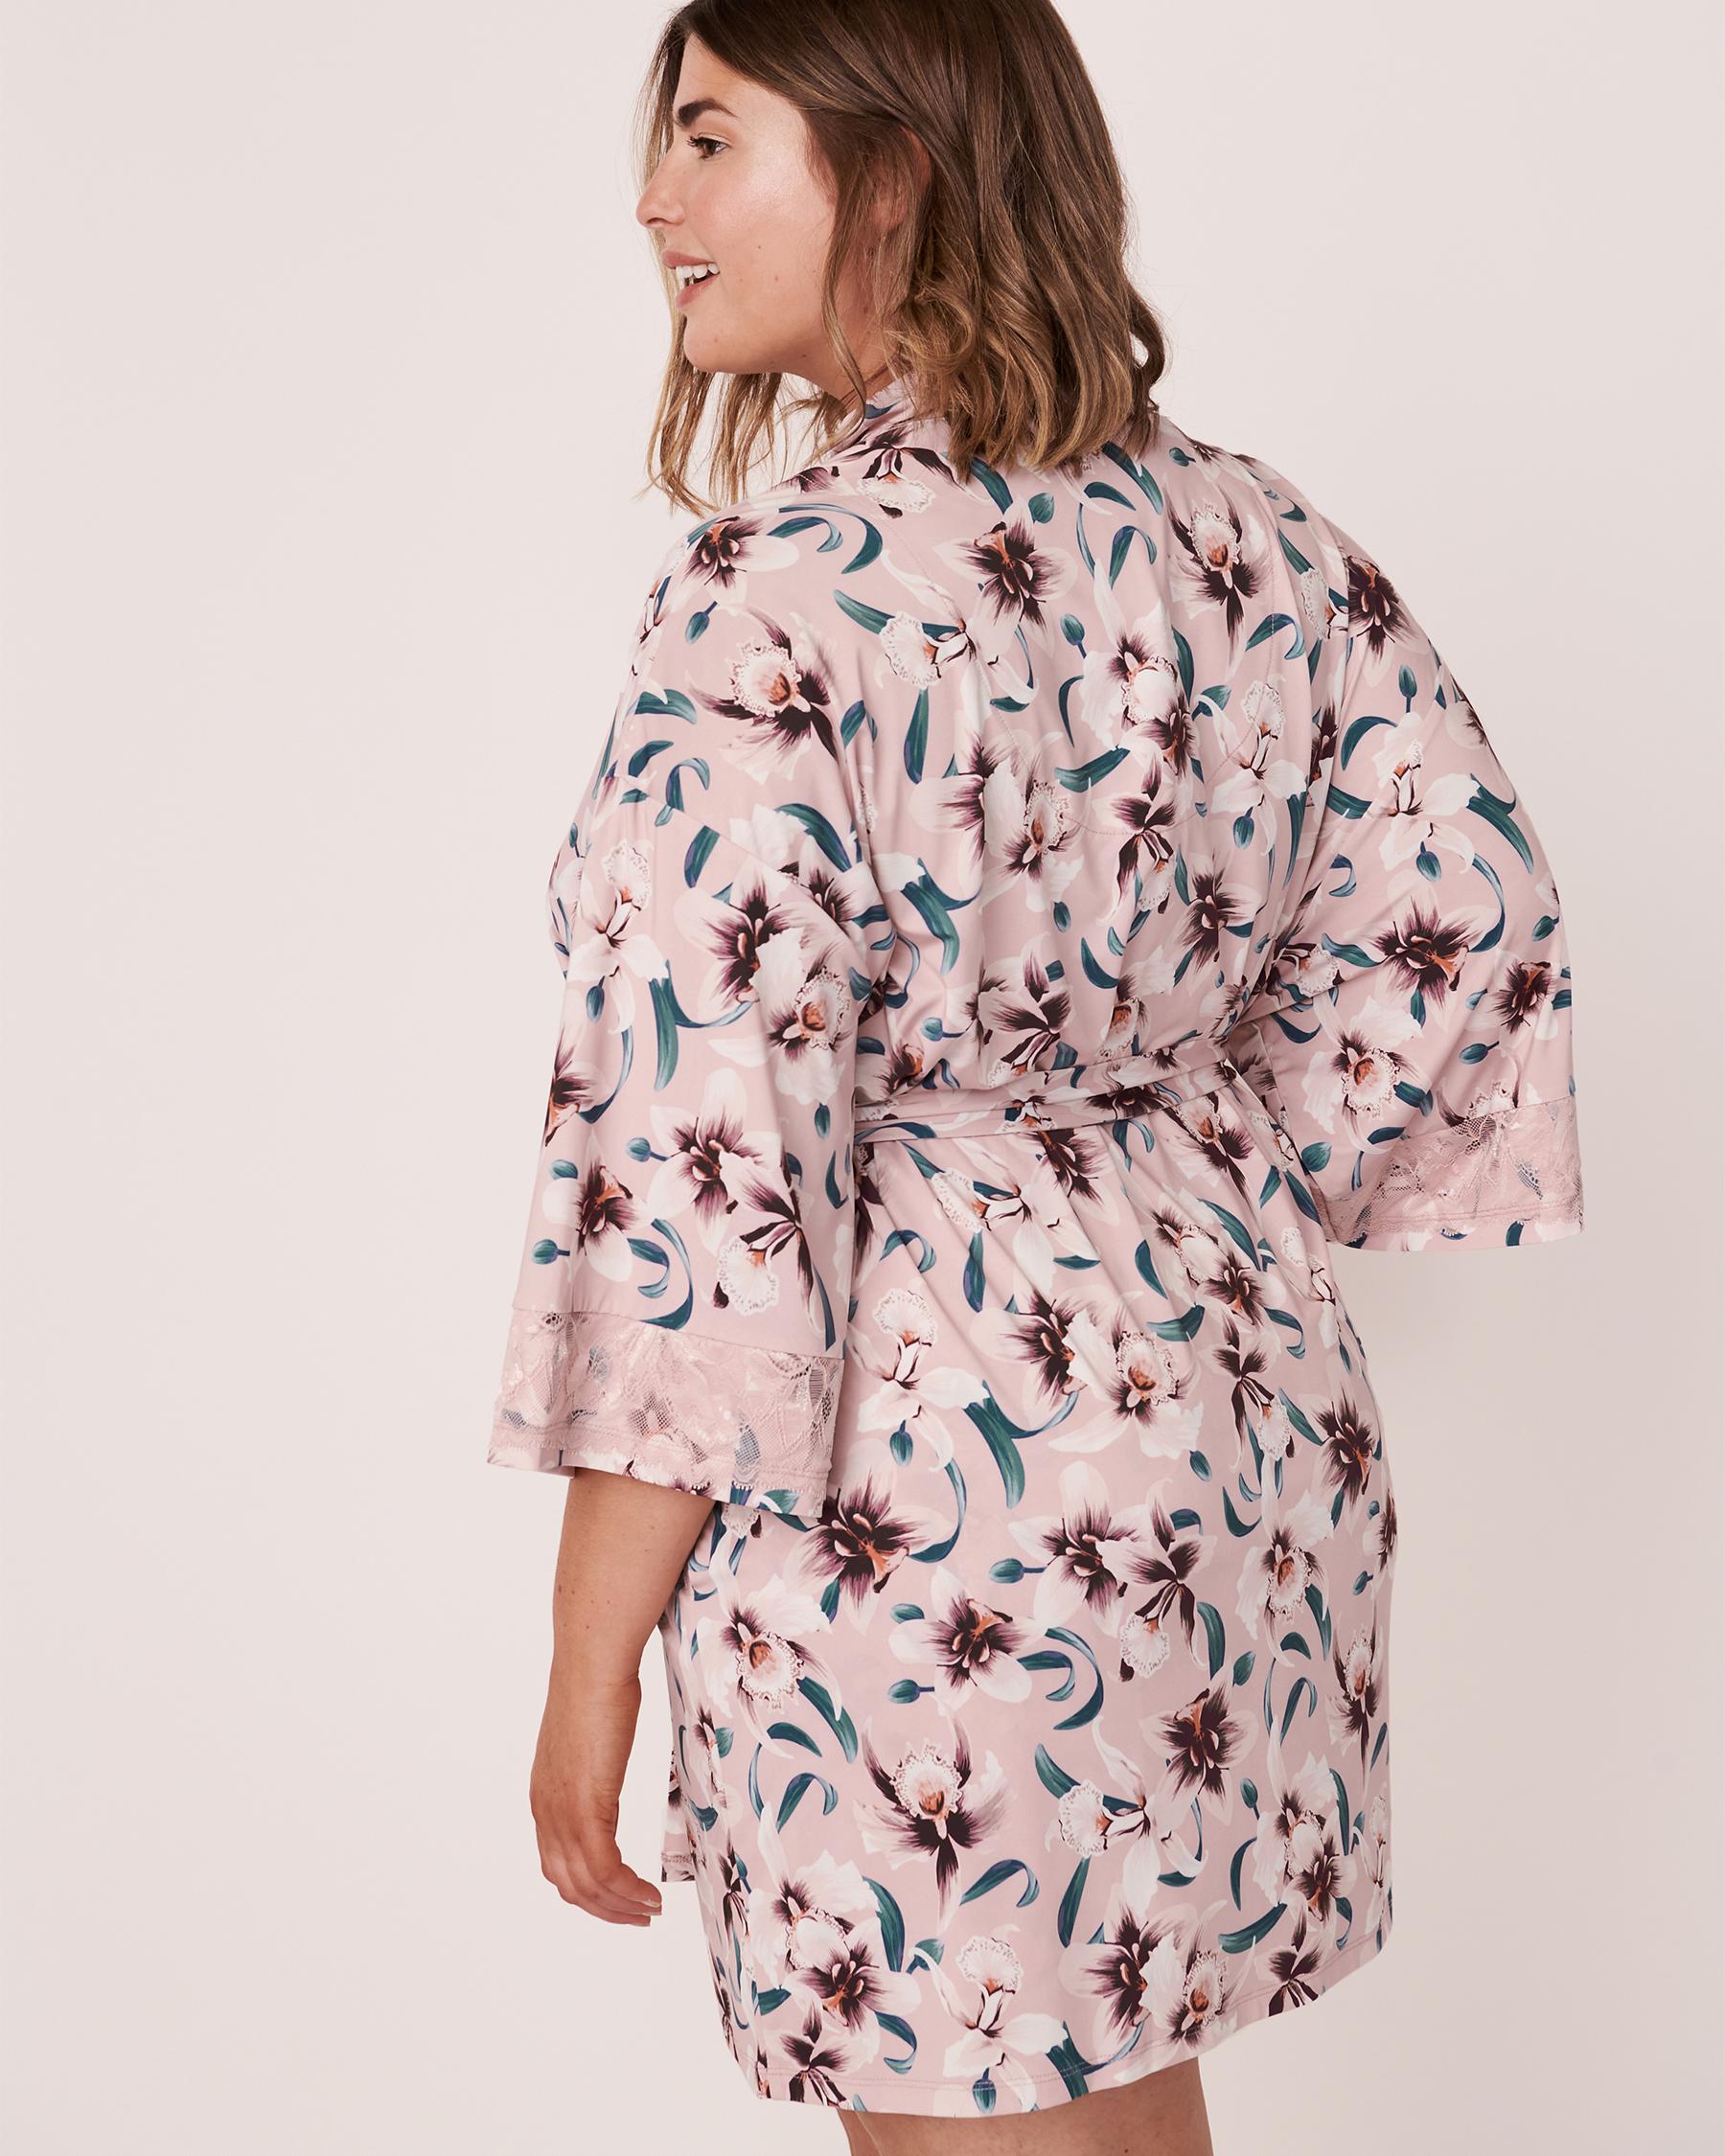 LA VIE EN ROSE Recycled Fibers Lace Trim Kimono Orchids 60600008 - View2